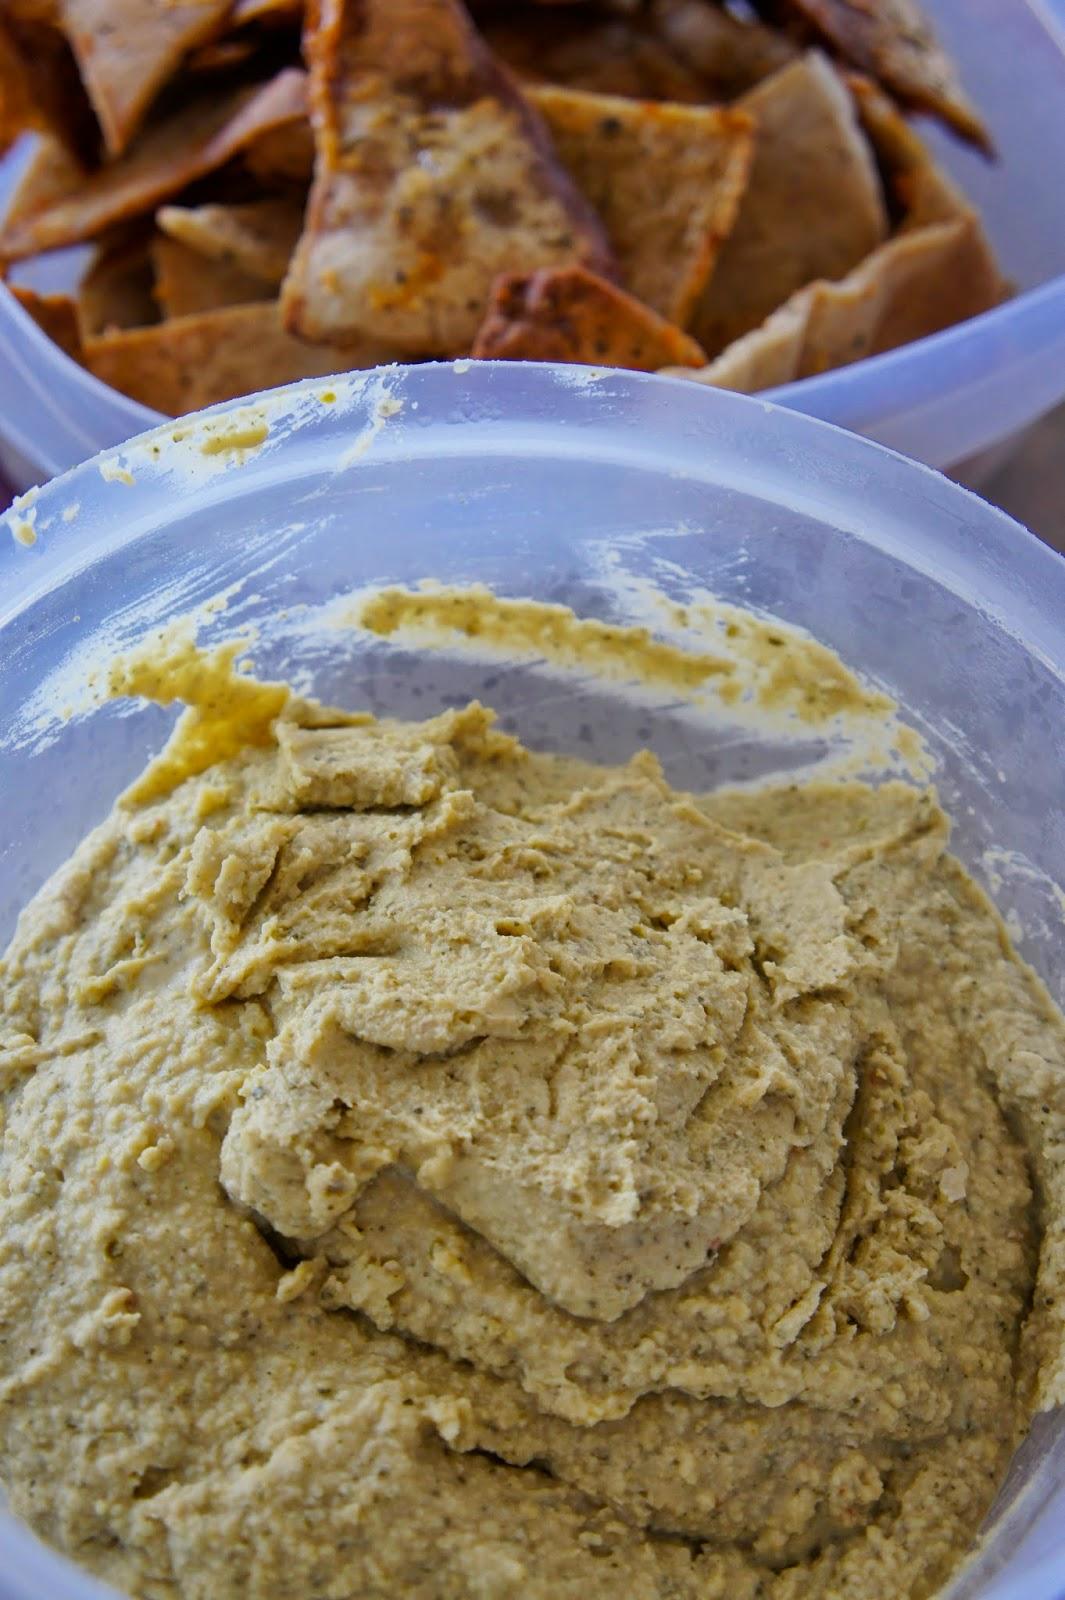 Savory Sweet and Satisfying: Jalapeño Lime Hummus